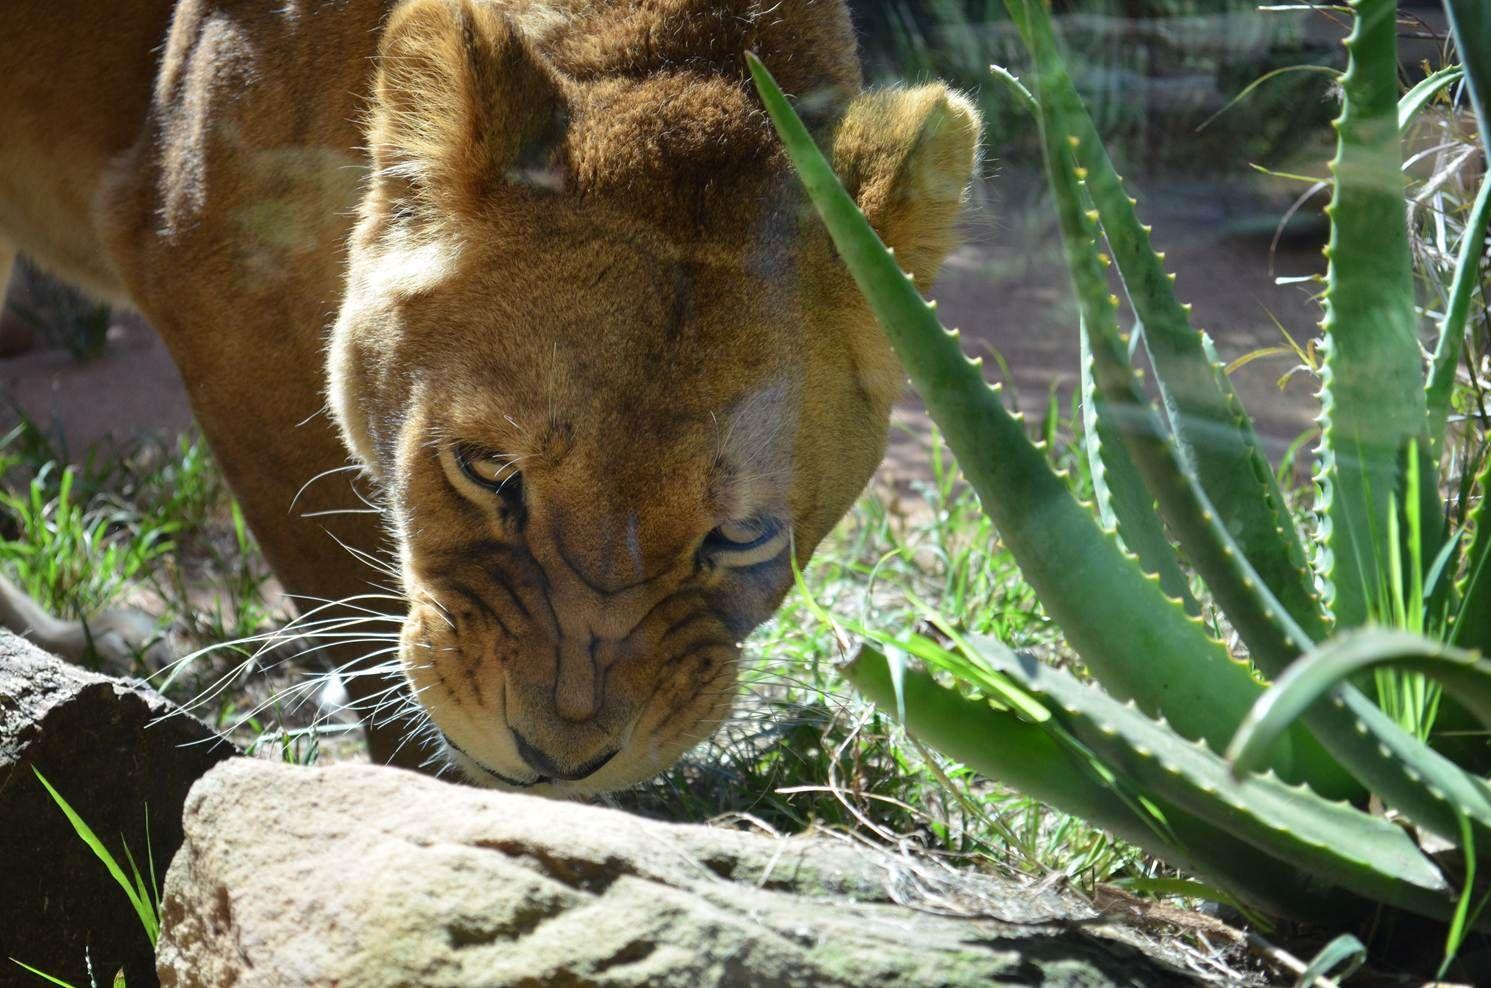 Lioness, Taronga Zoo